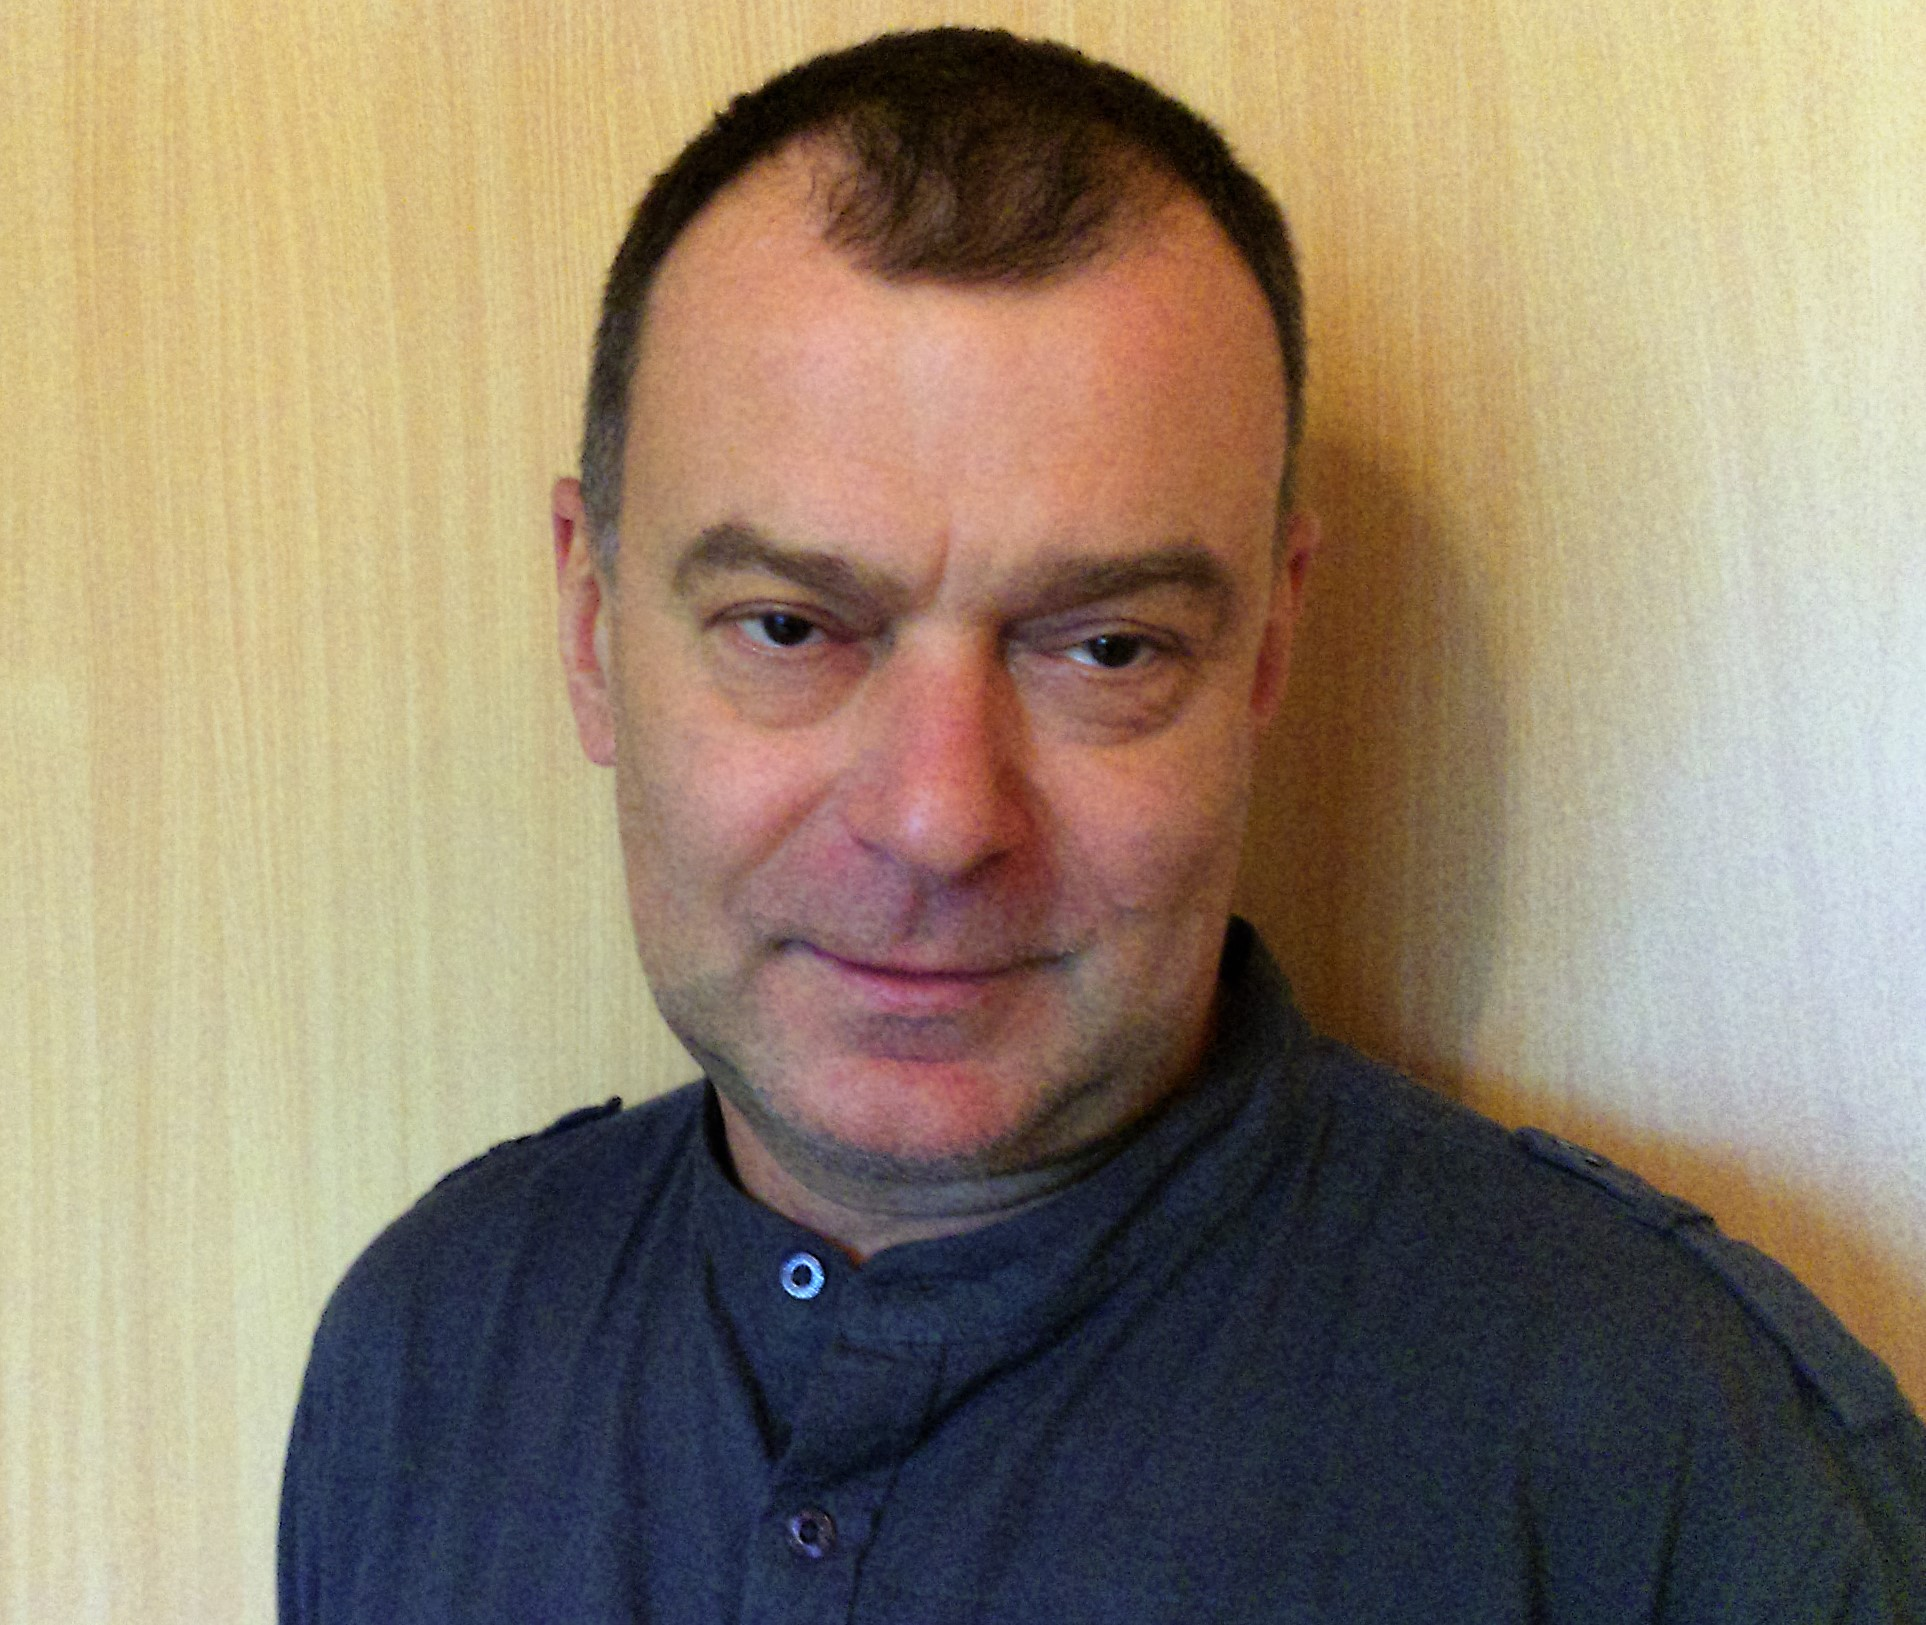 personel-thumb-Piotr-Pawelek